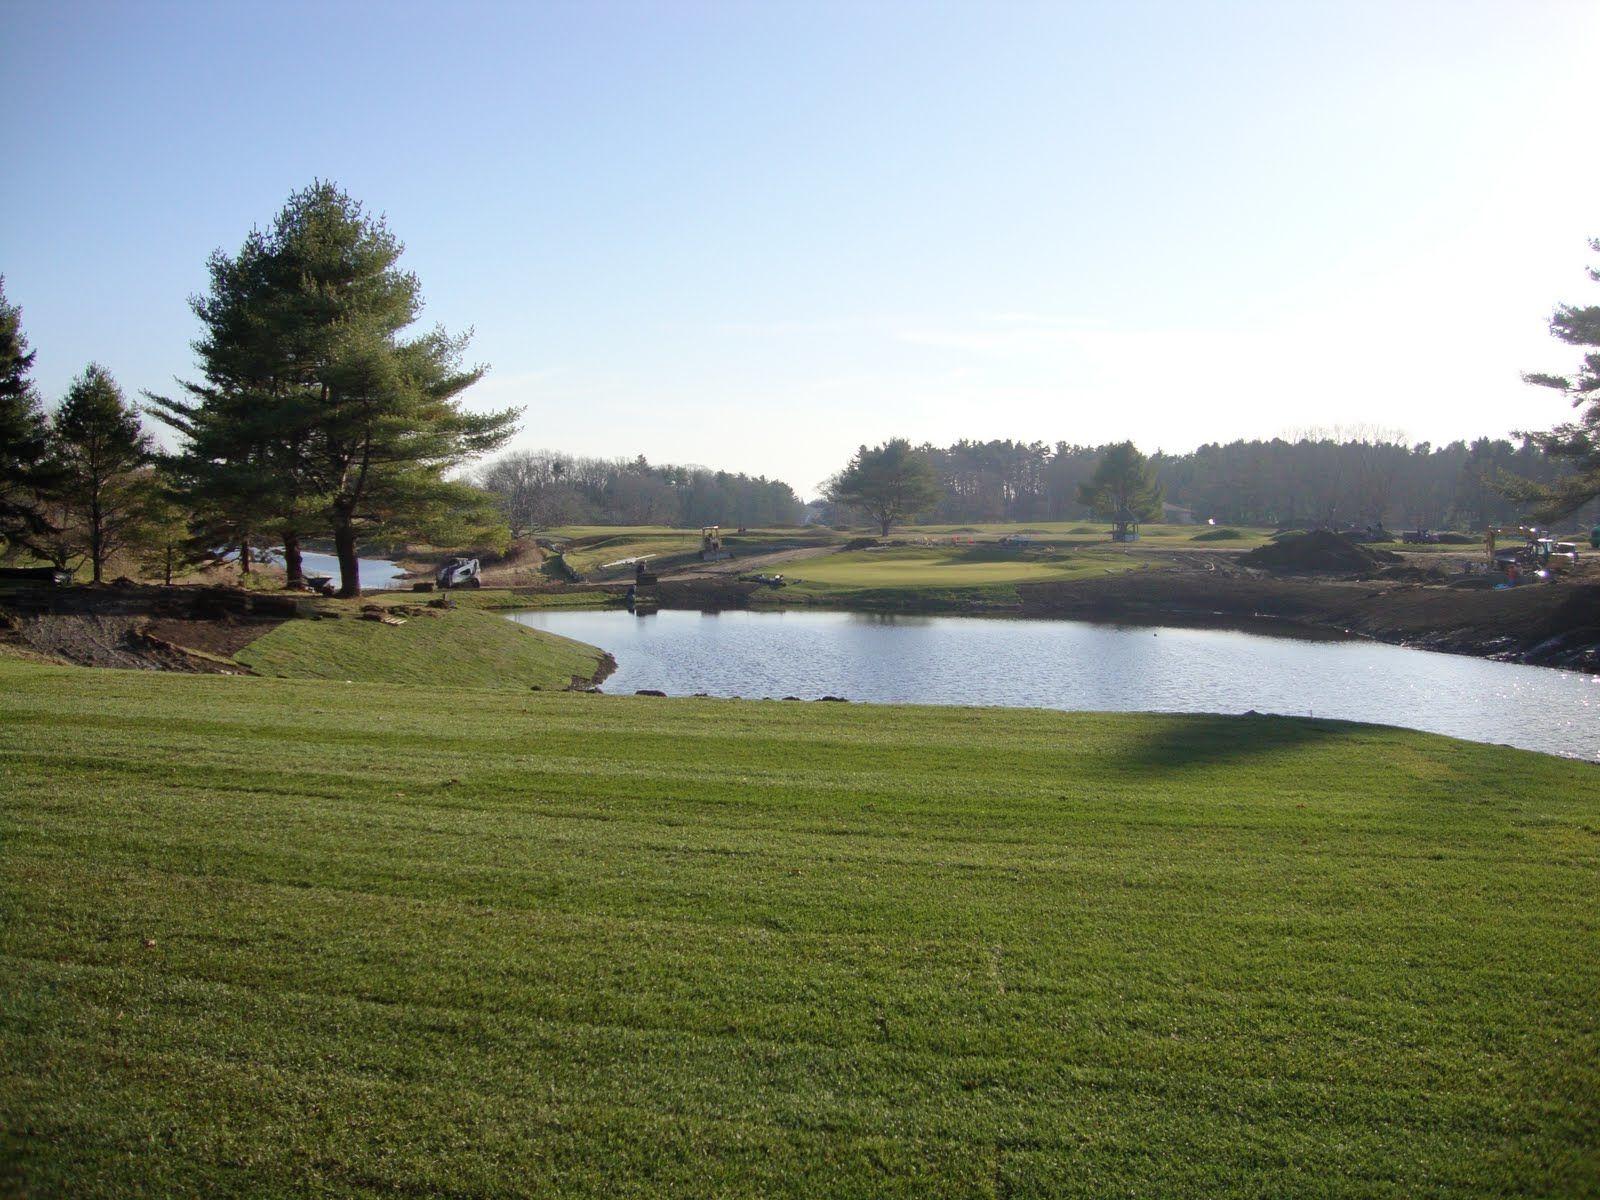 Cape arundel golf club cover picture